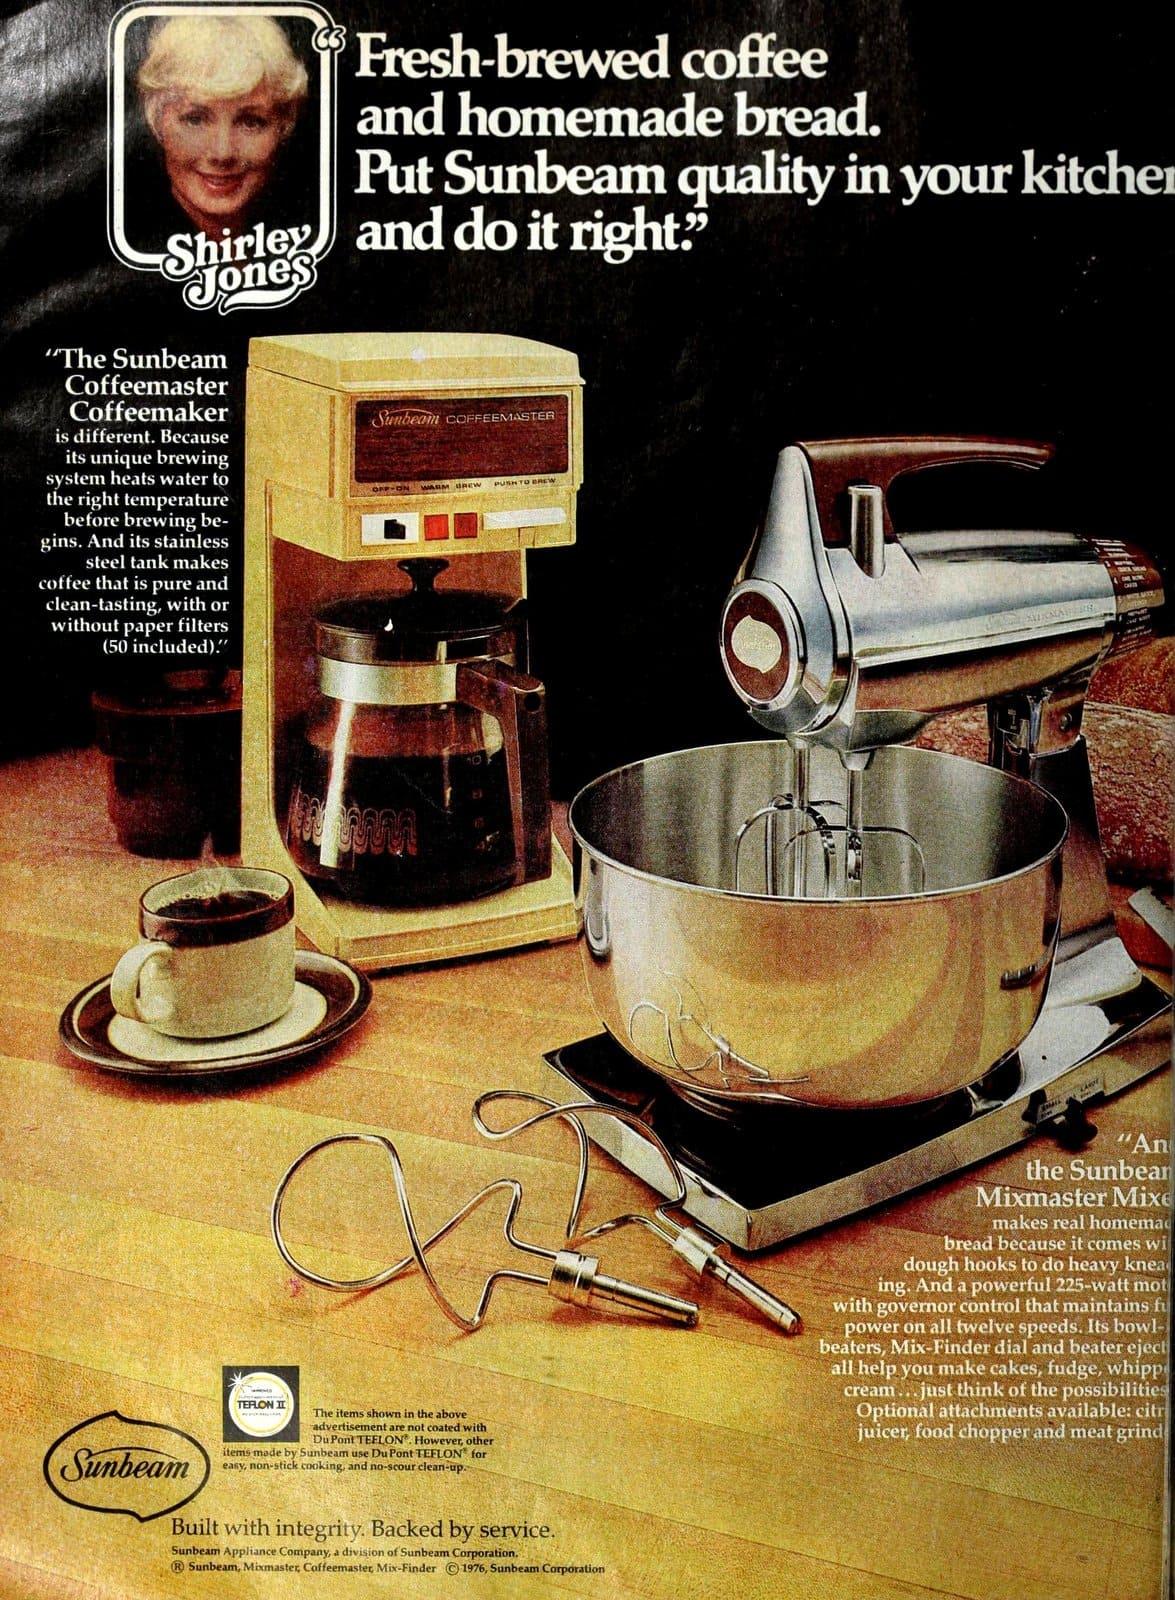 Retro Sunbeam Mixmaster mixer with wood-effect handle (1976)